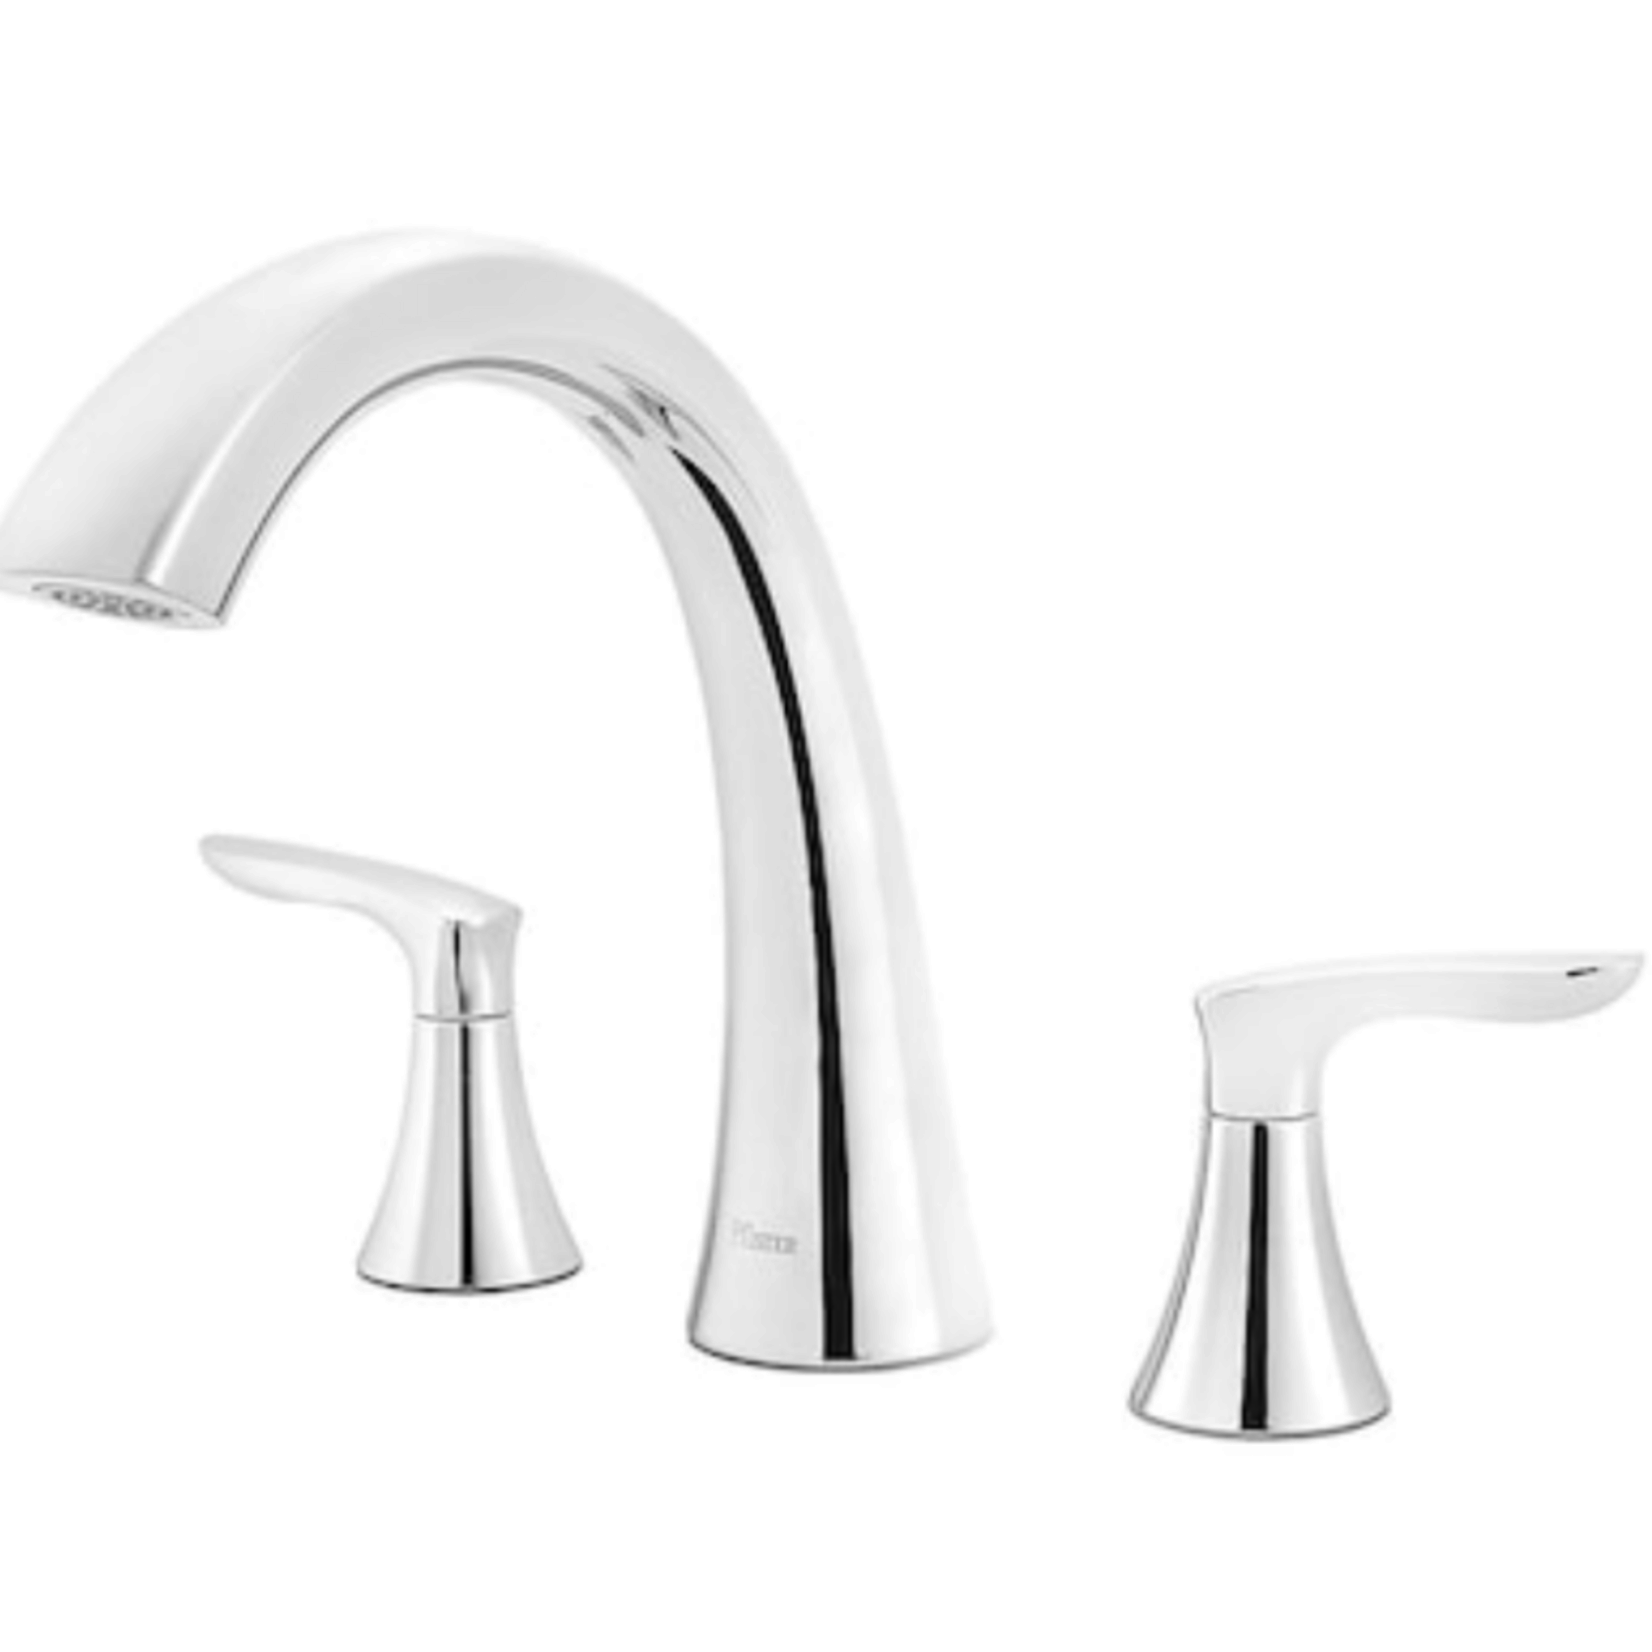 2910 Pfister Weller Polished Chrome Roman 2-Handle Bathtub Faucet